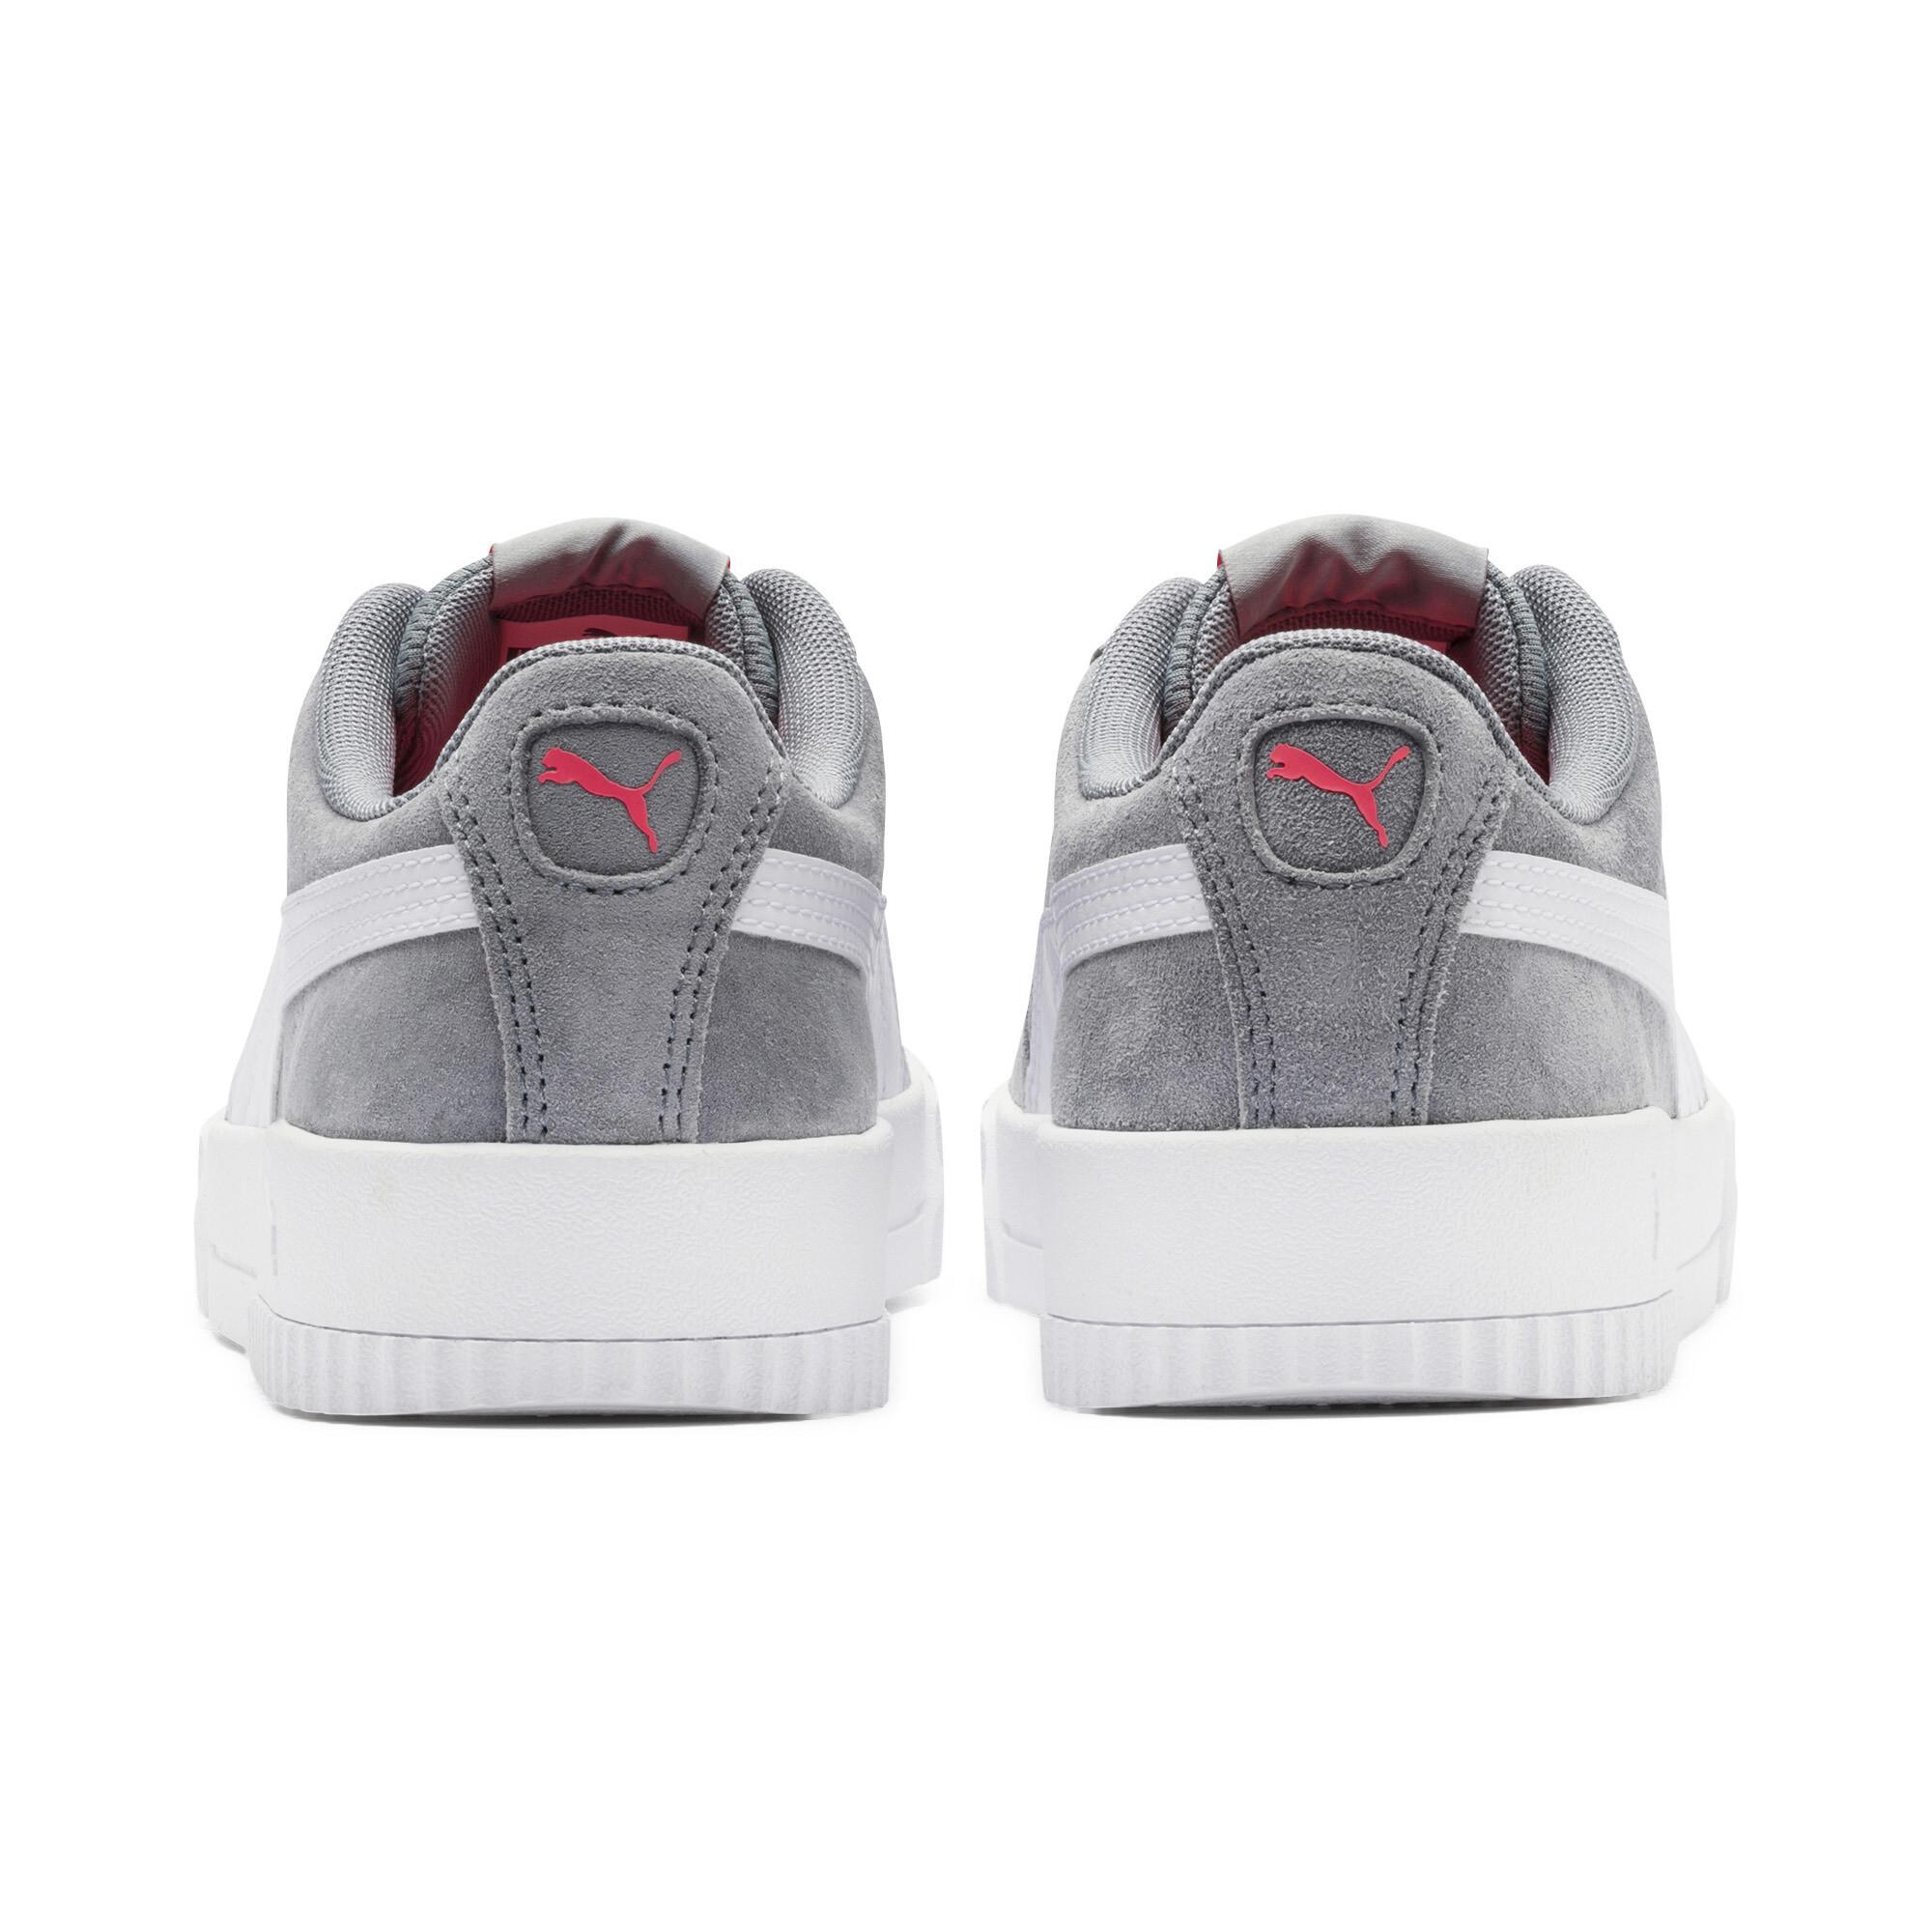 PUMA-Carina-Women-s-Sneakers-Women-Shoe-Basics thumbnail 3